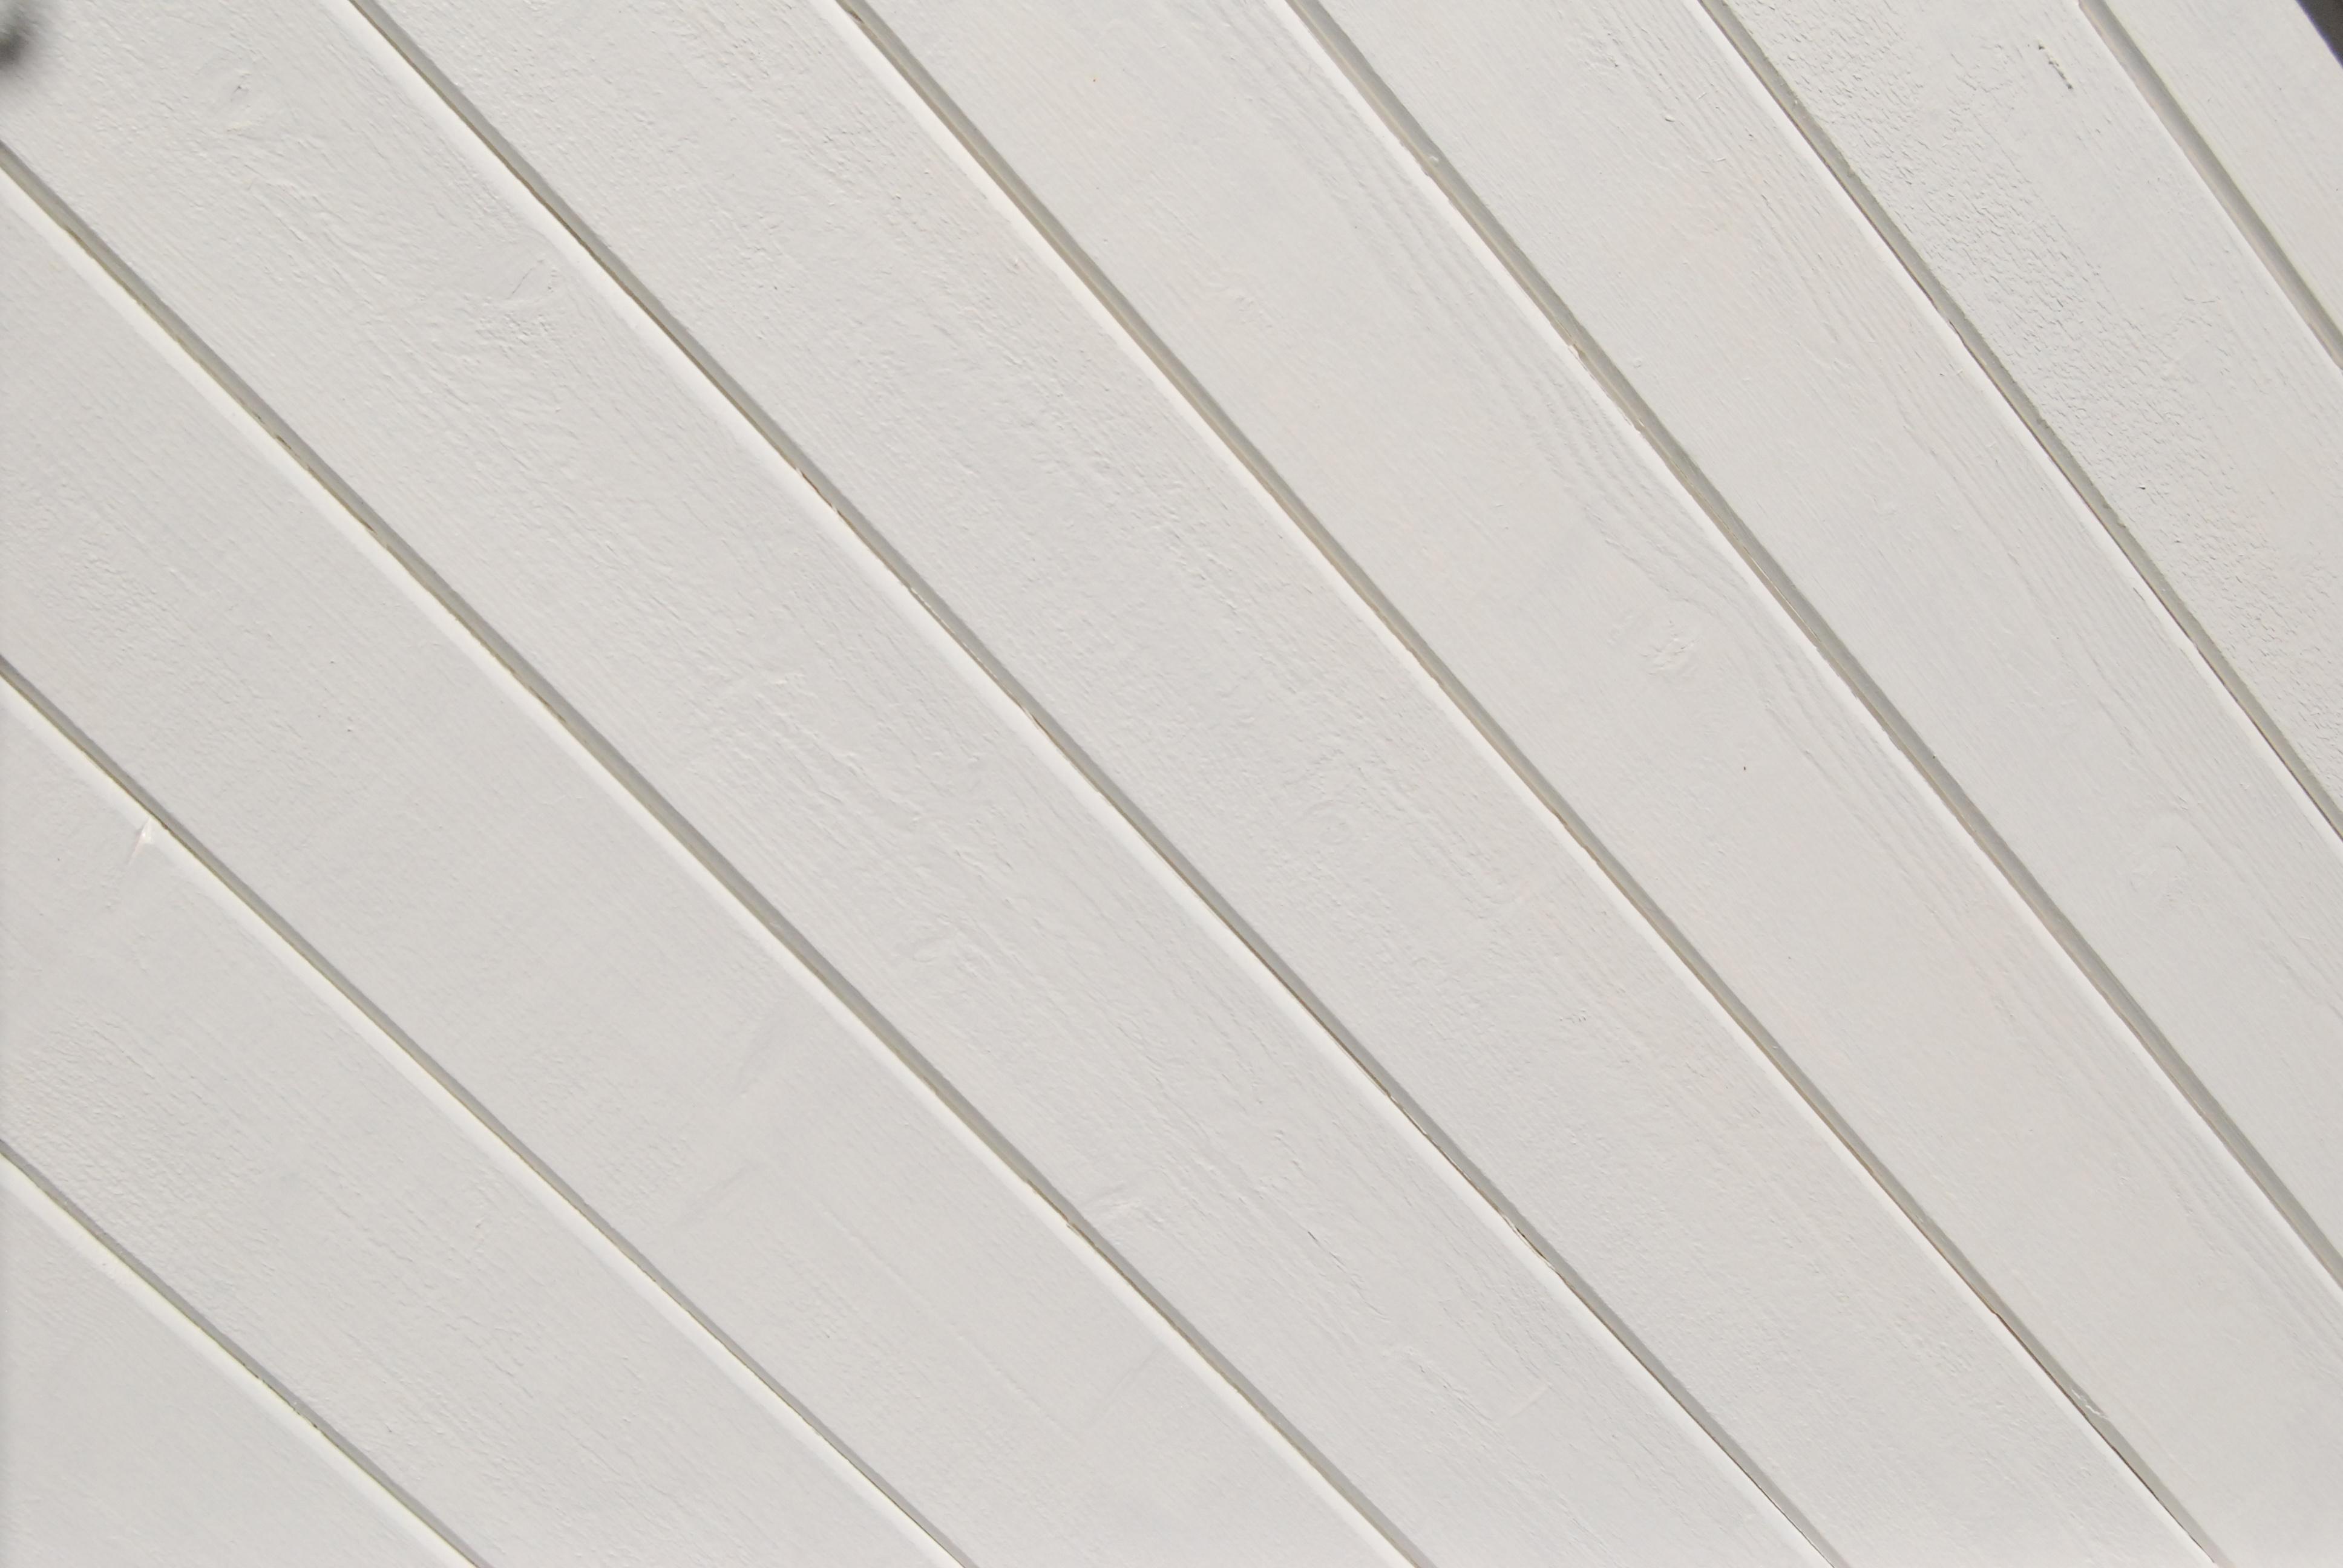 White wood panels stock by Cathorse stock on DeviantArt